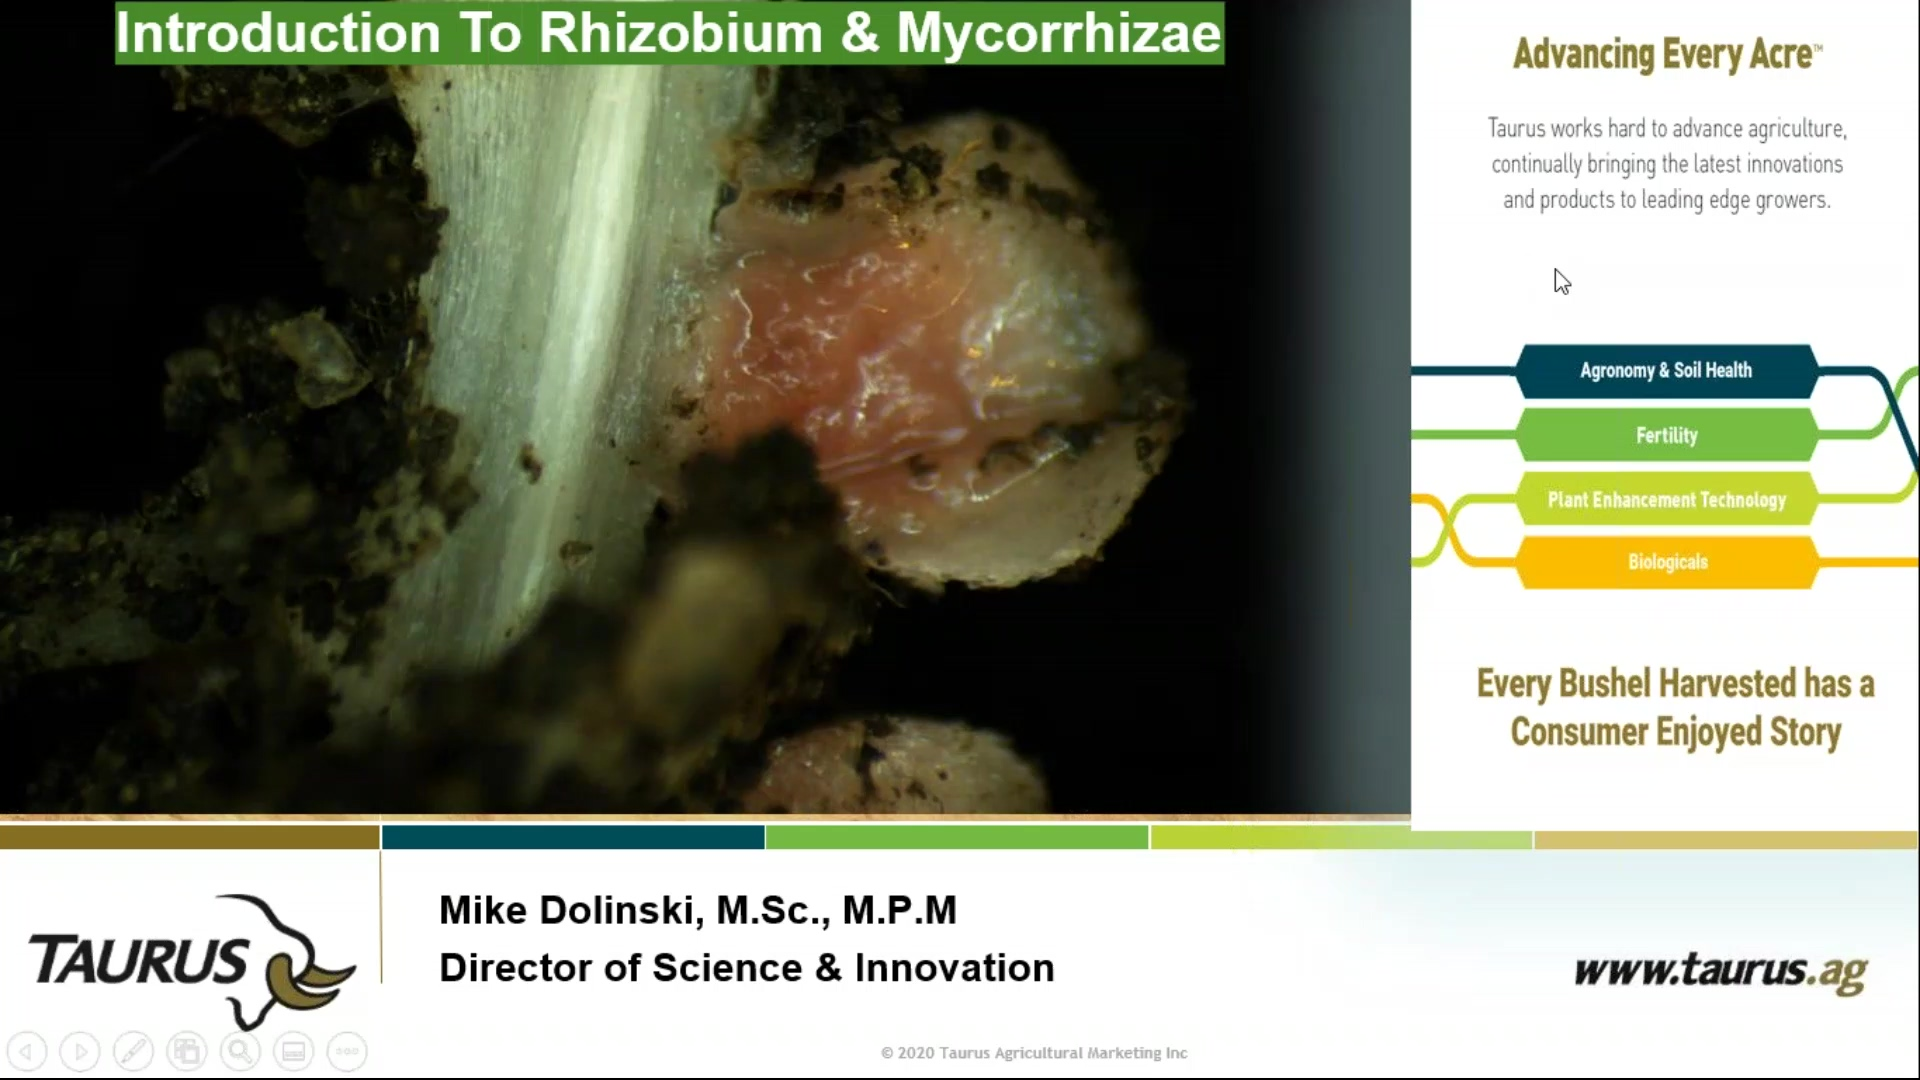 Introduction to Rhizobium & Mycorrhizae-Mike Dolinski- Feb 2020